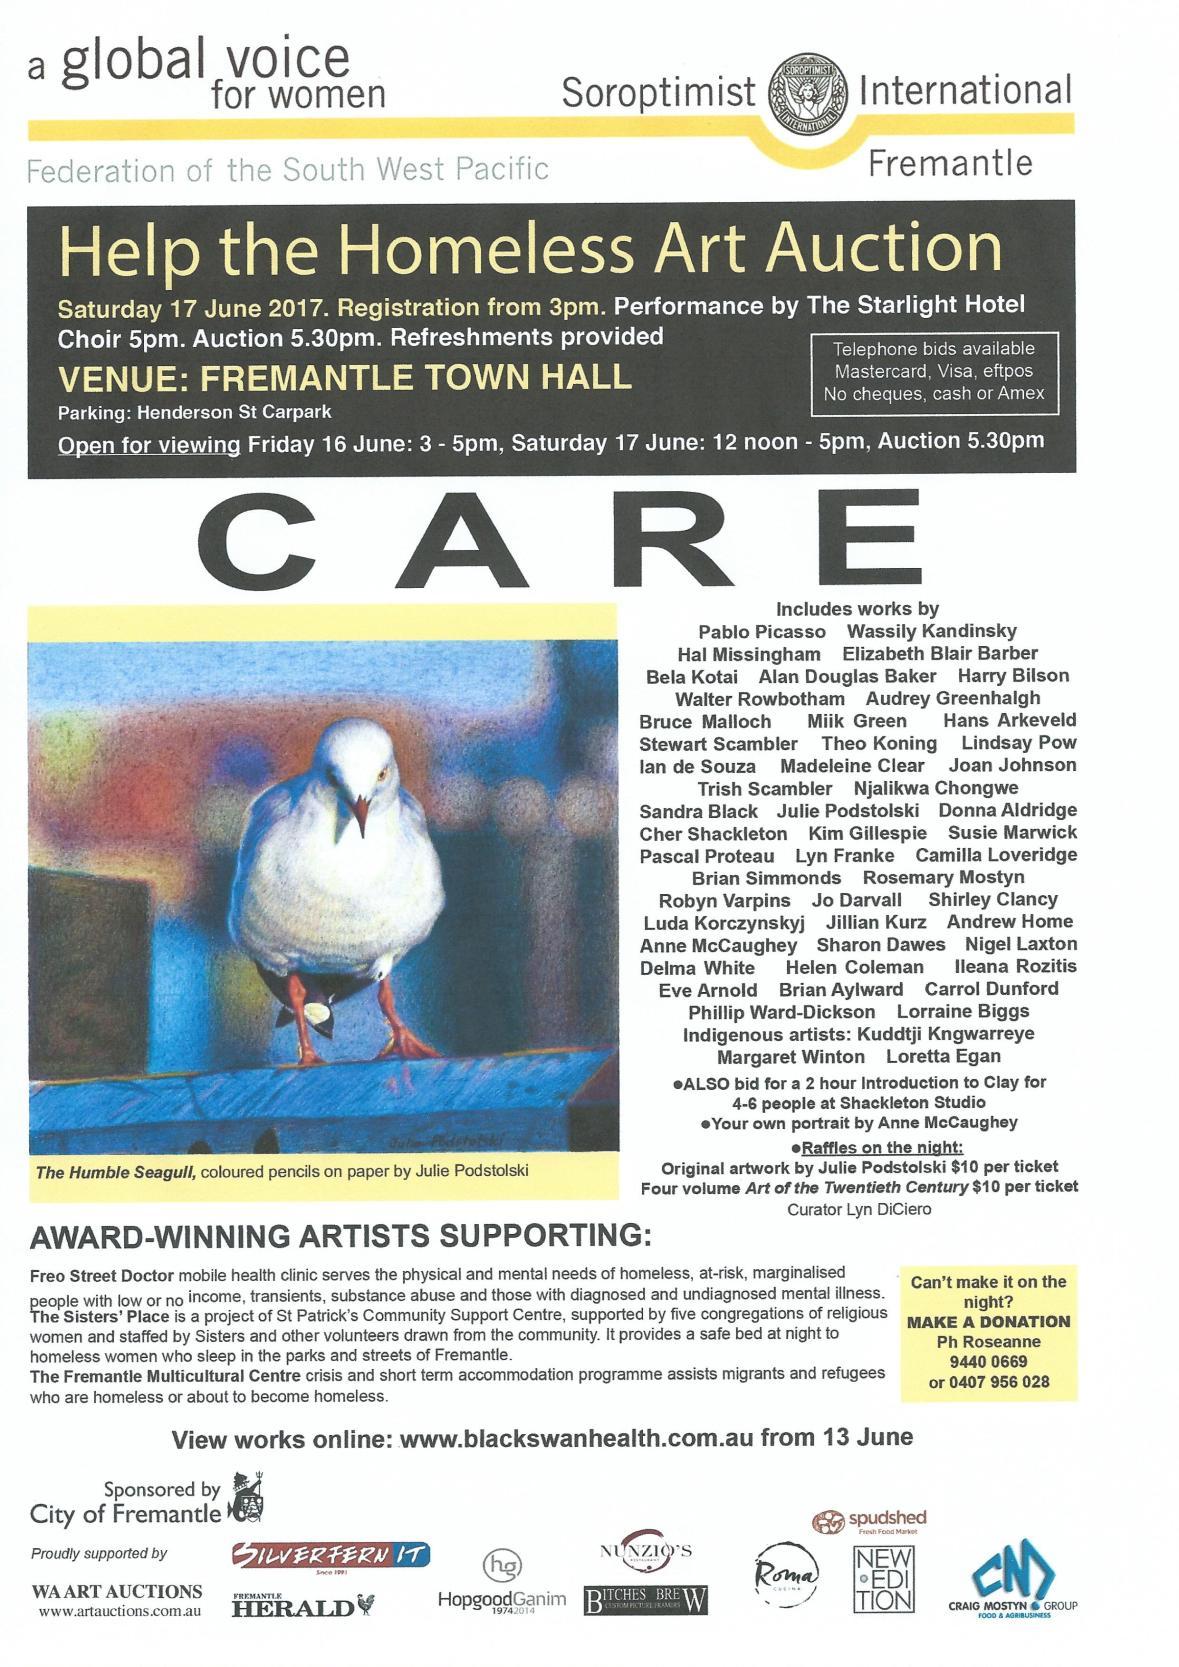 Homeless Auction 2017 flyer